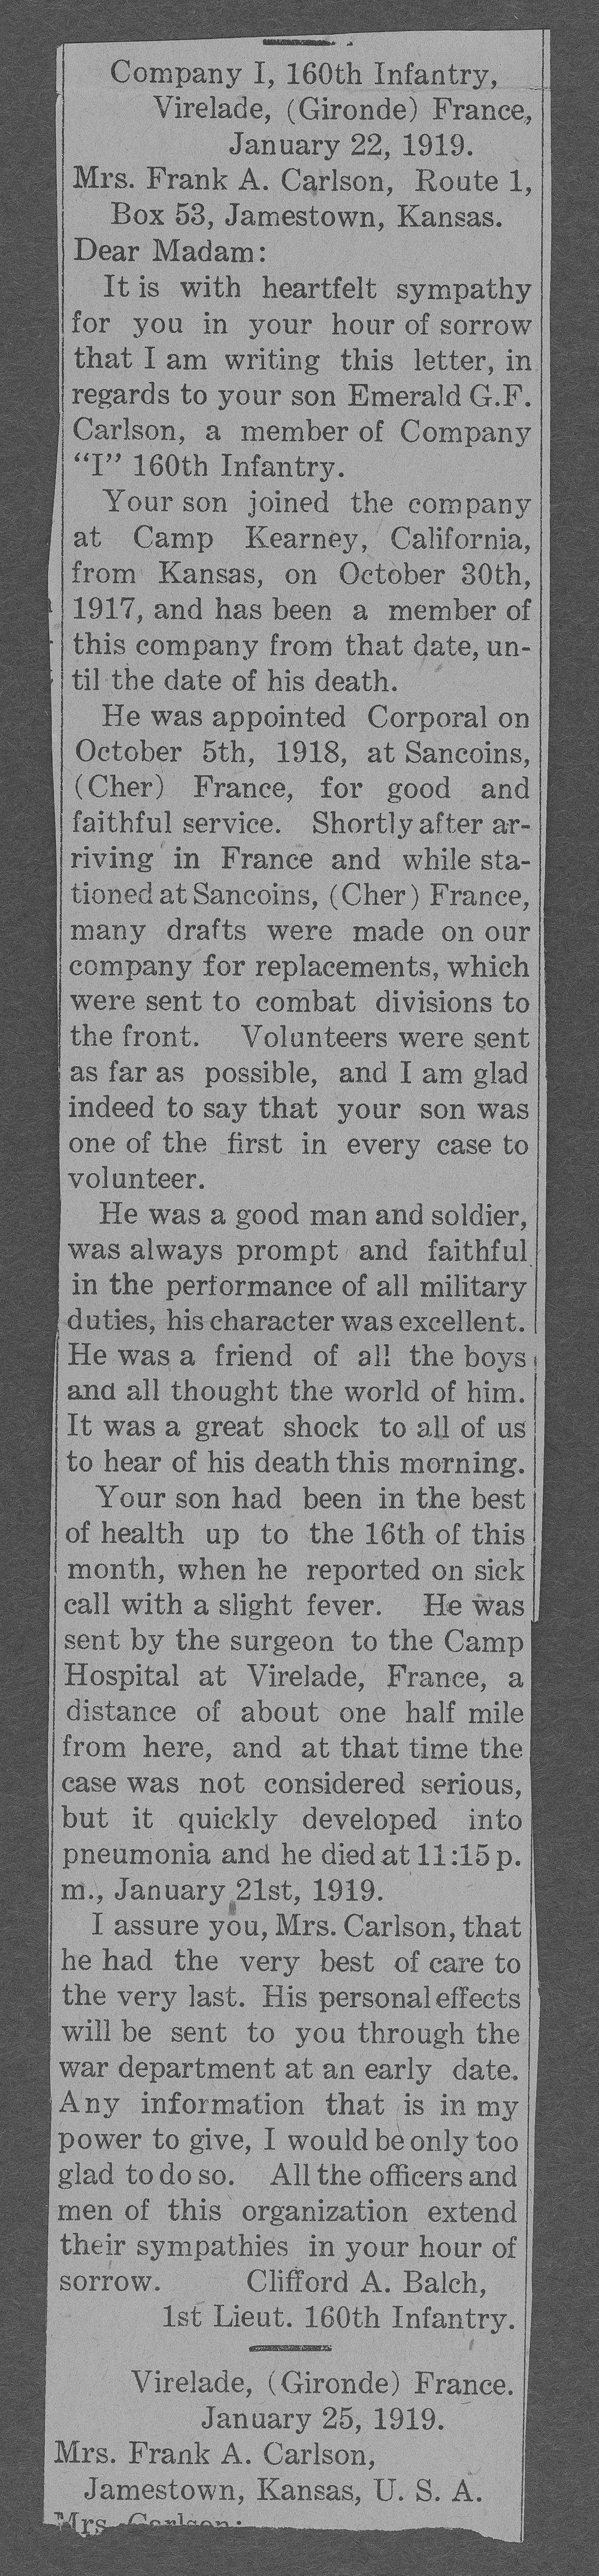 Emerald G.F. Carlson, World War I soldier - 8